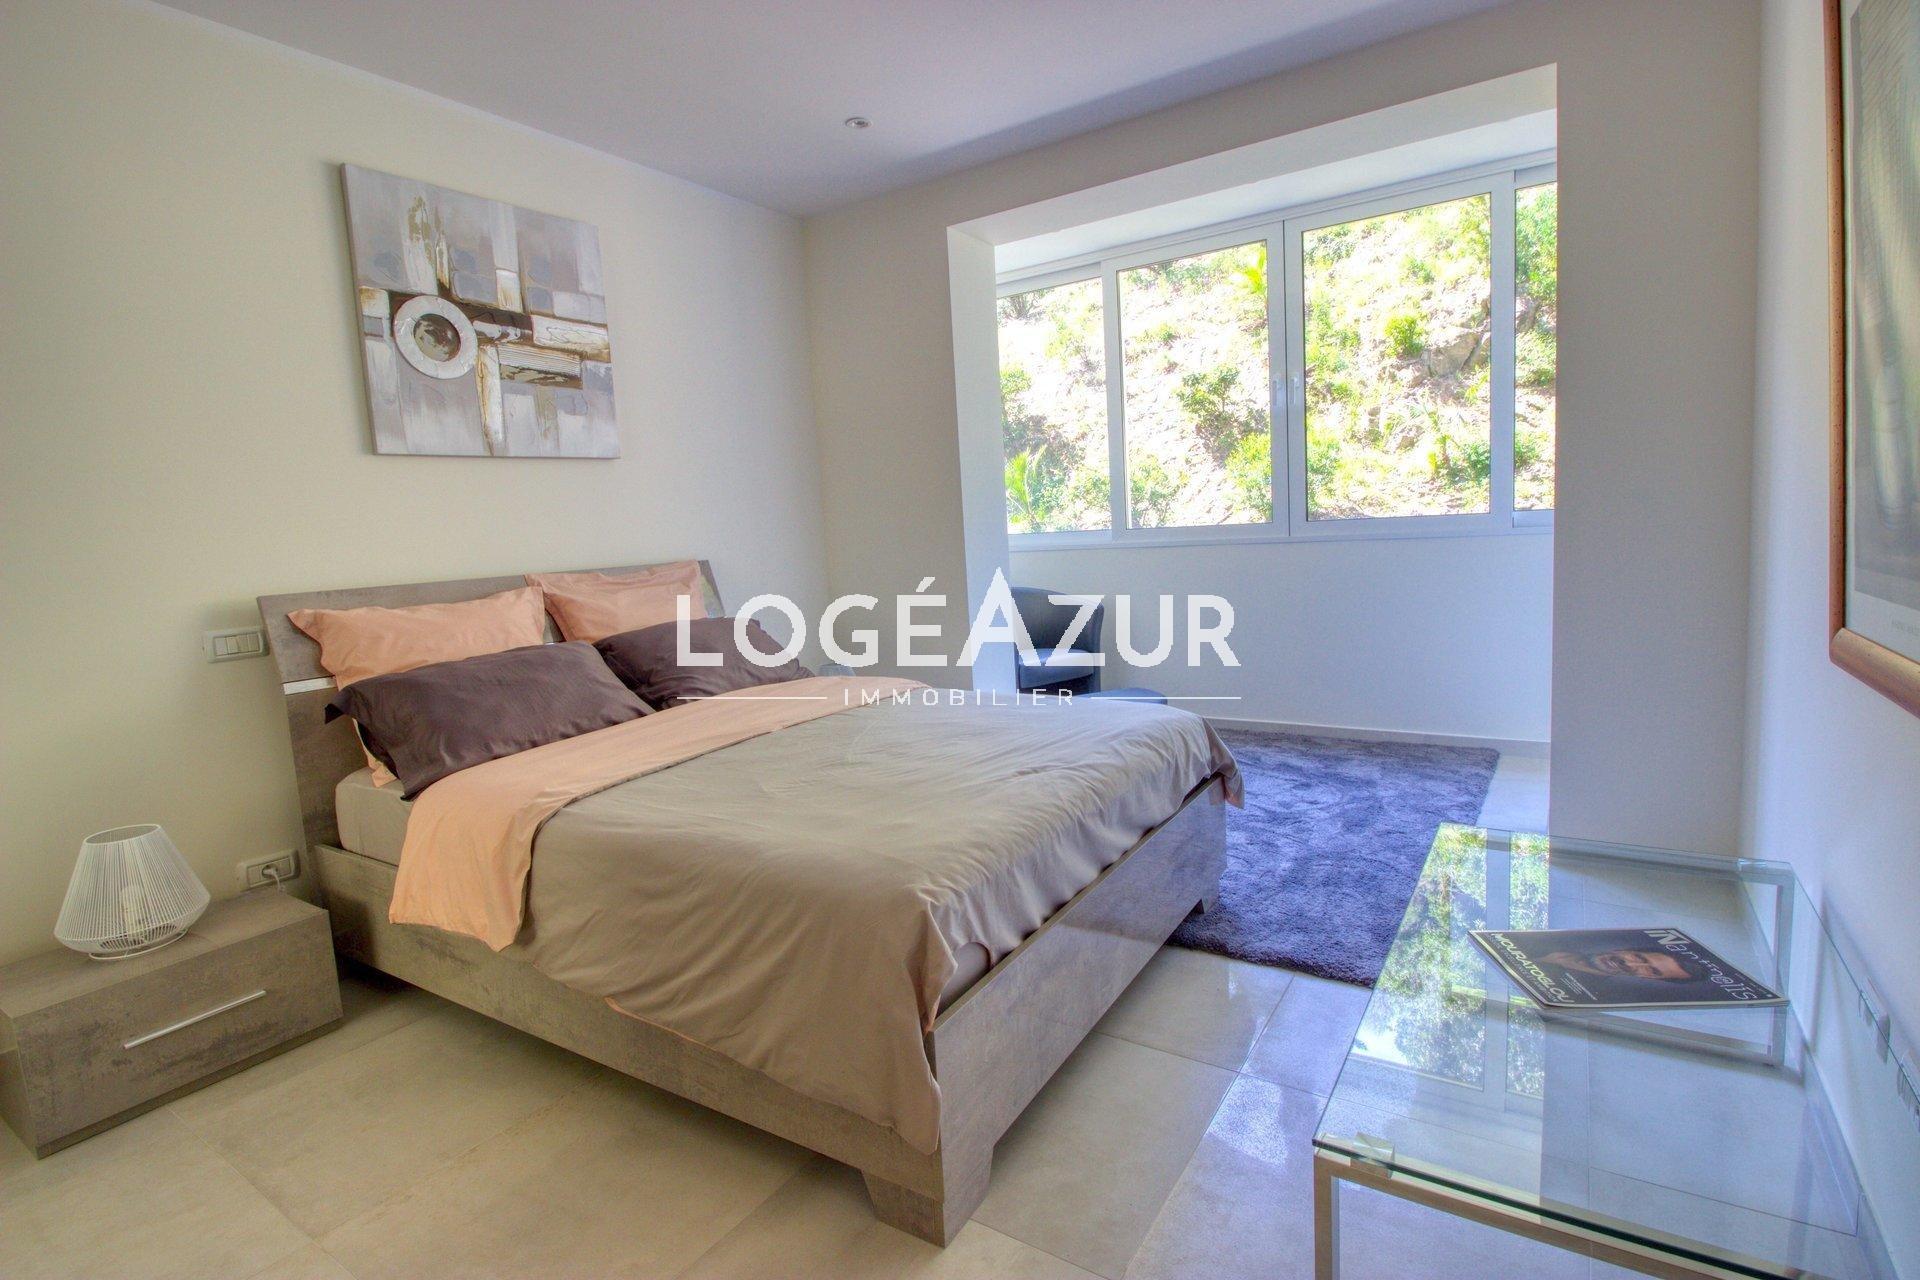 Appartement 2 / 3 chambres - CANNES CALIFORNIE / VALLAURIS